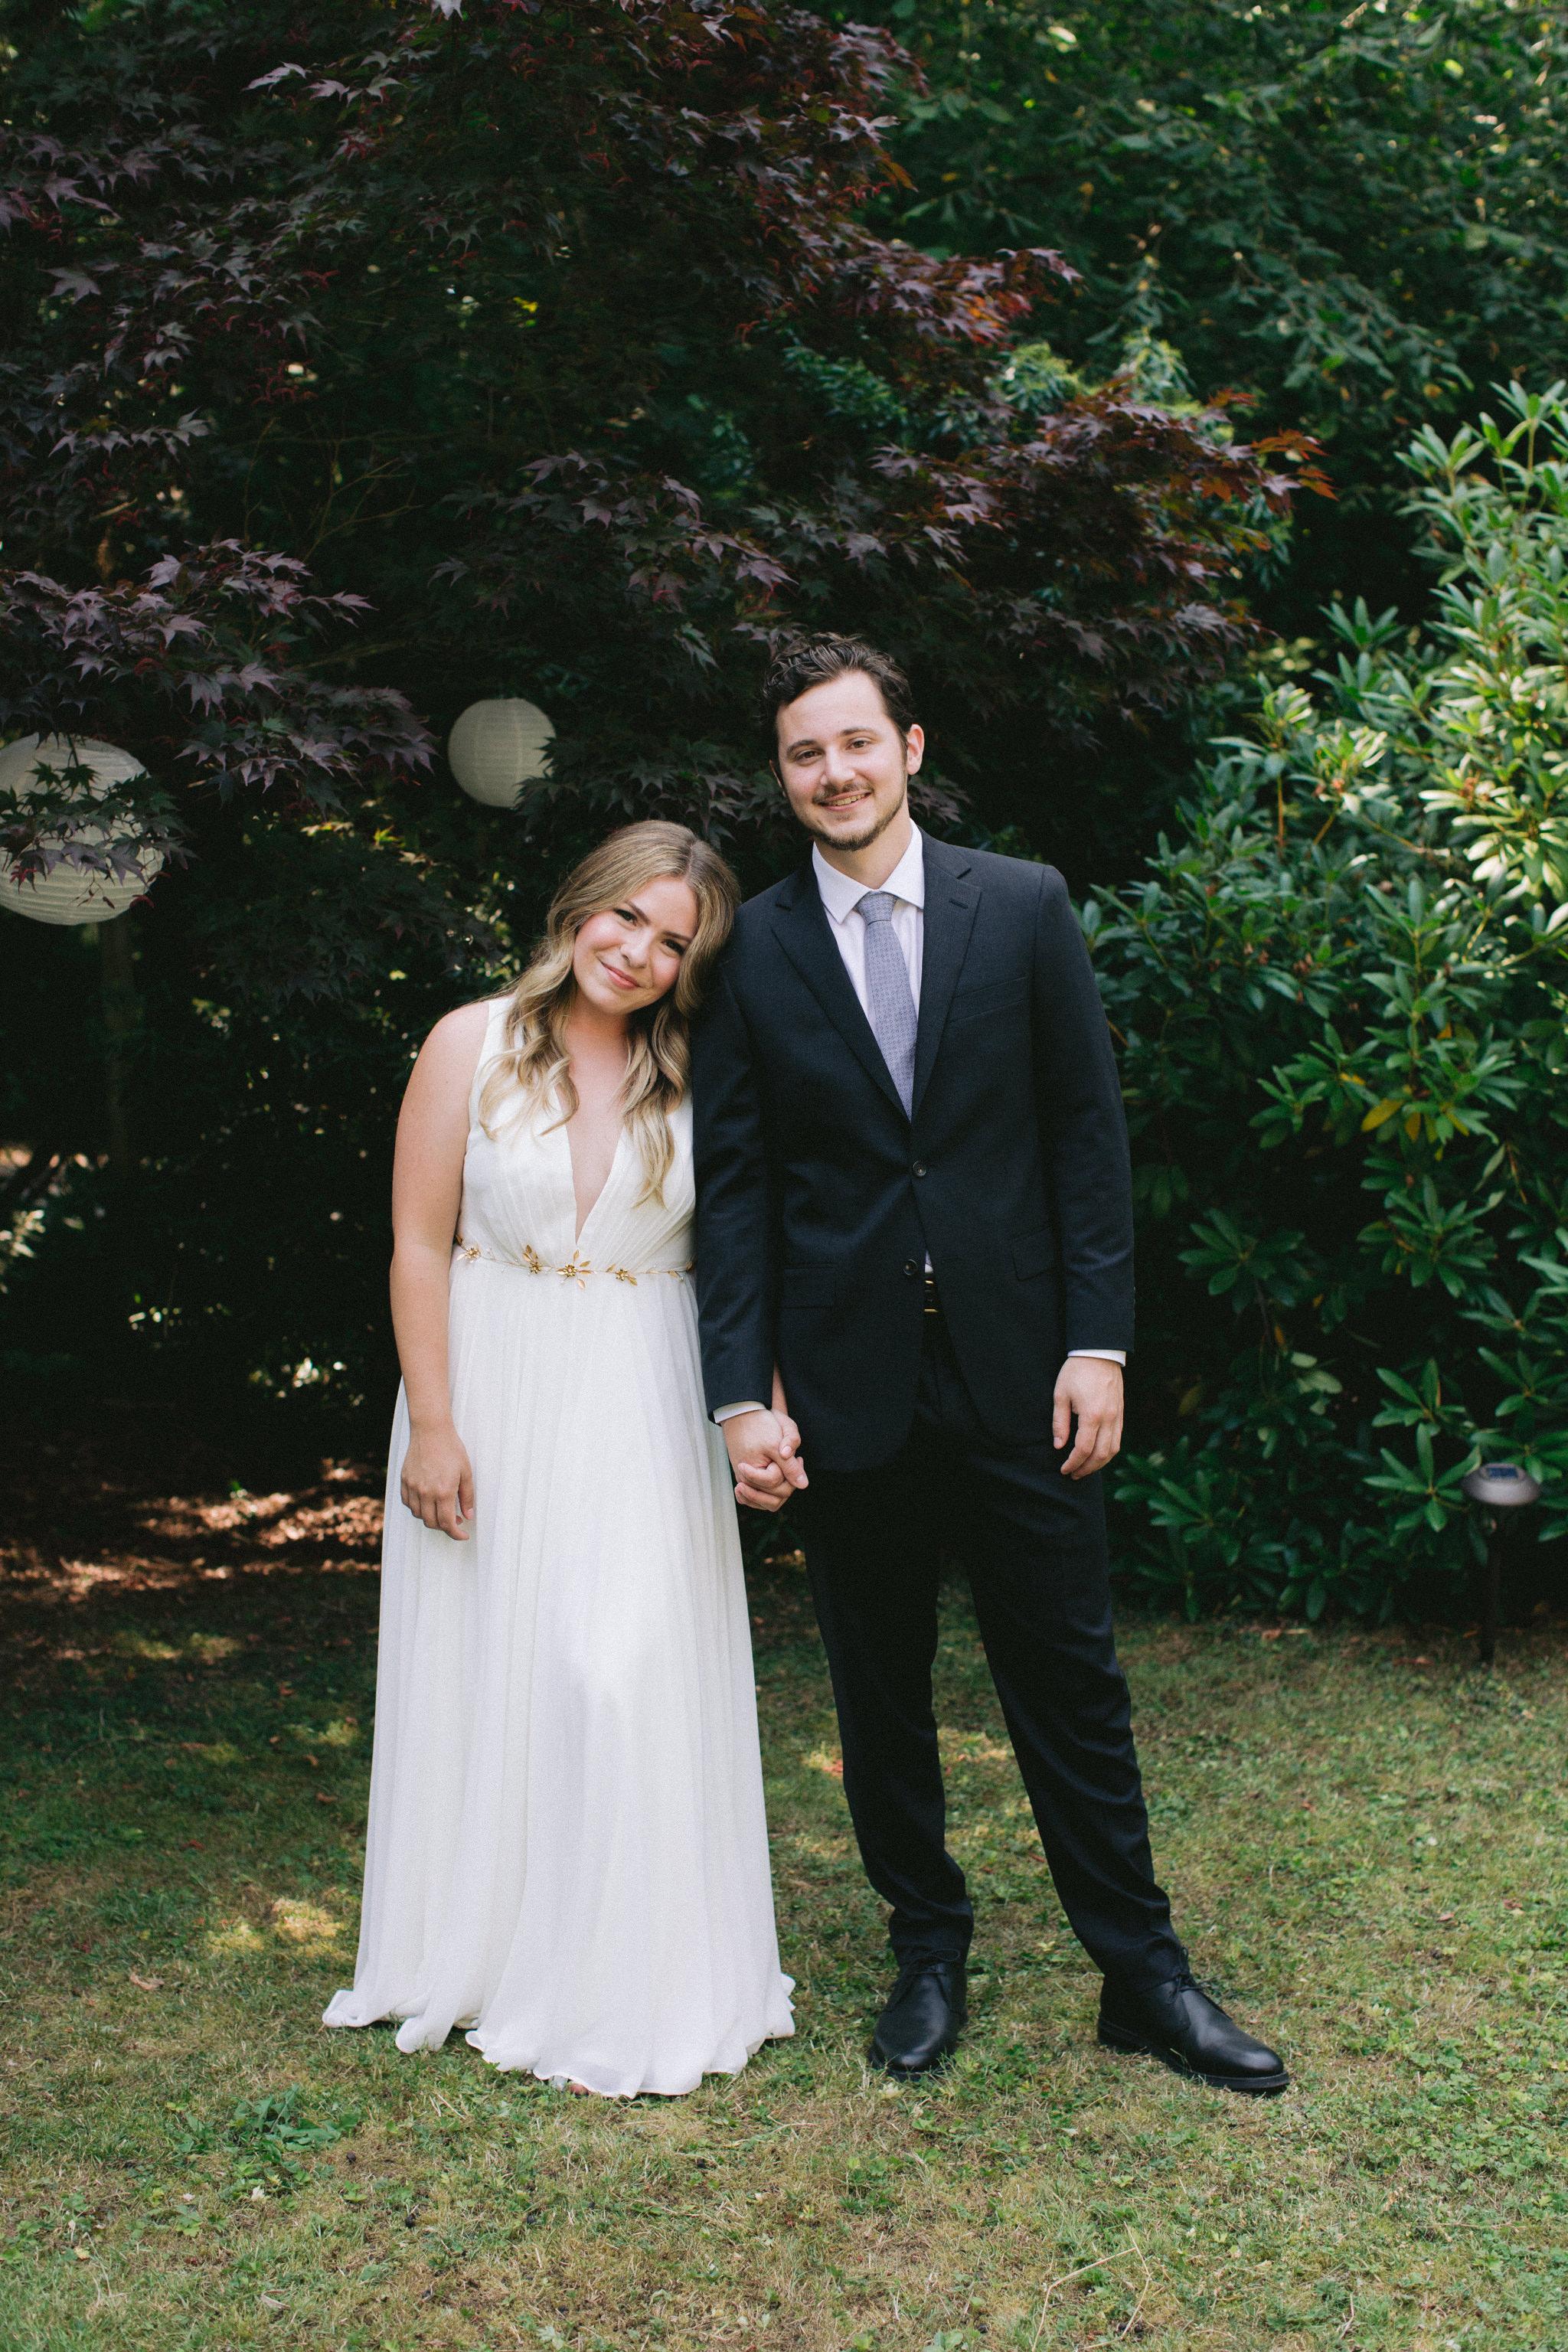 Backyard-Bainbridge-Island-Wedding-Alycia-Lovell-Photography-32.JPG